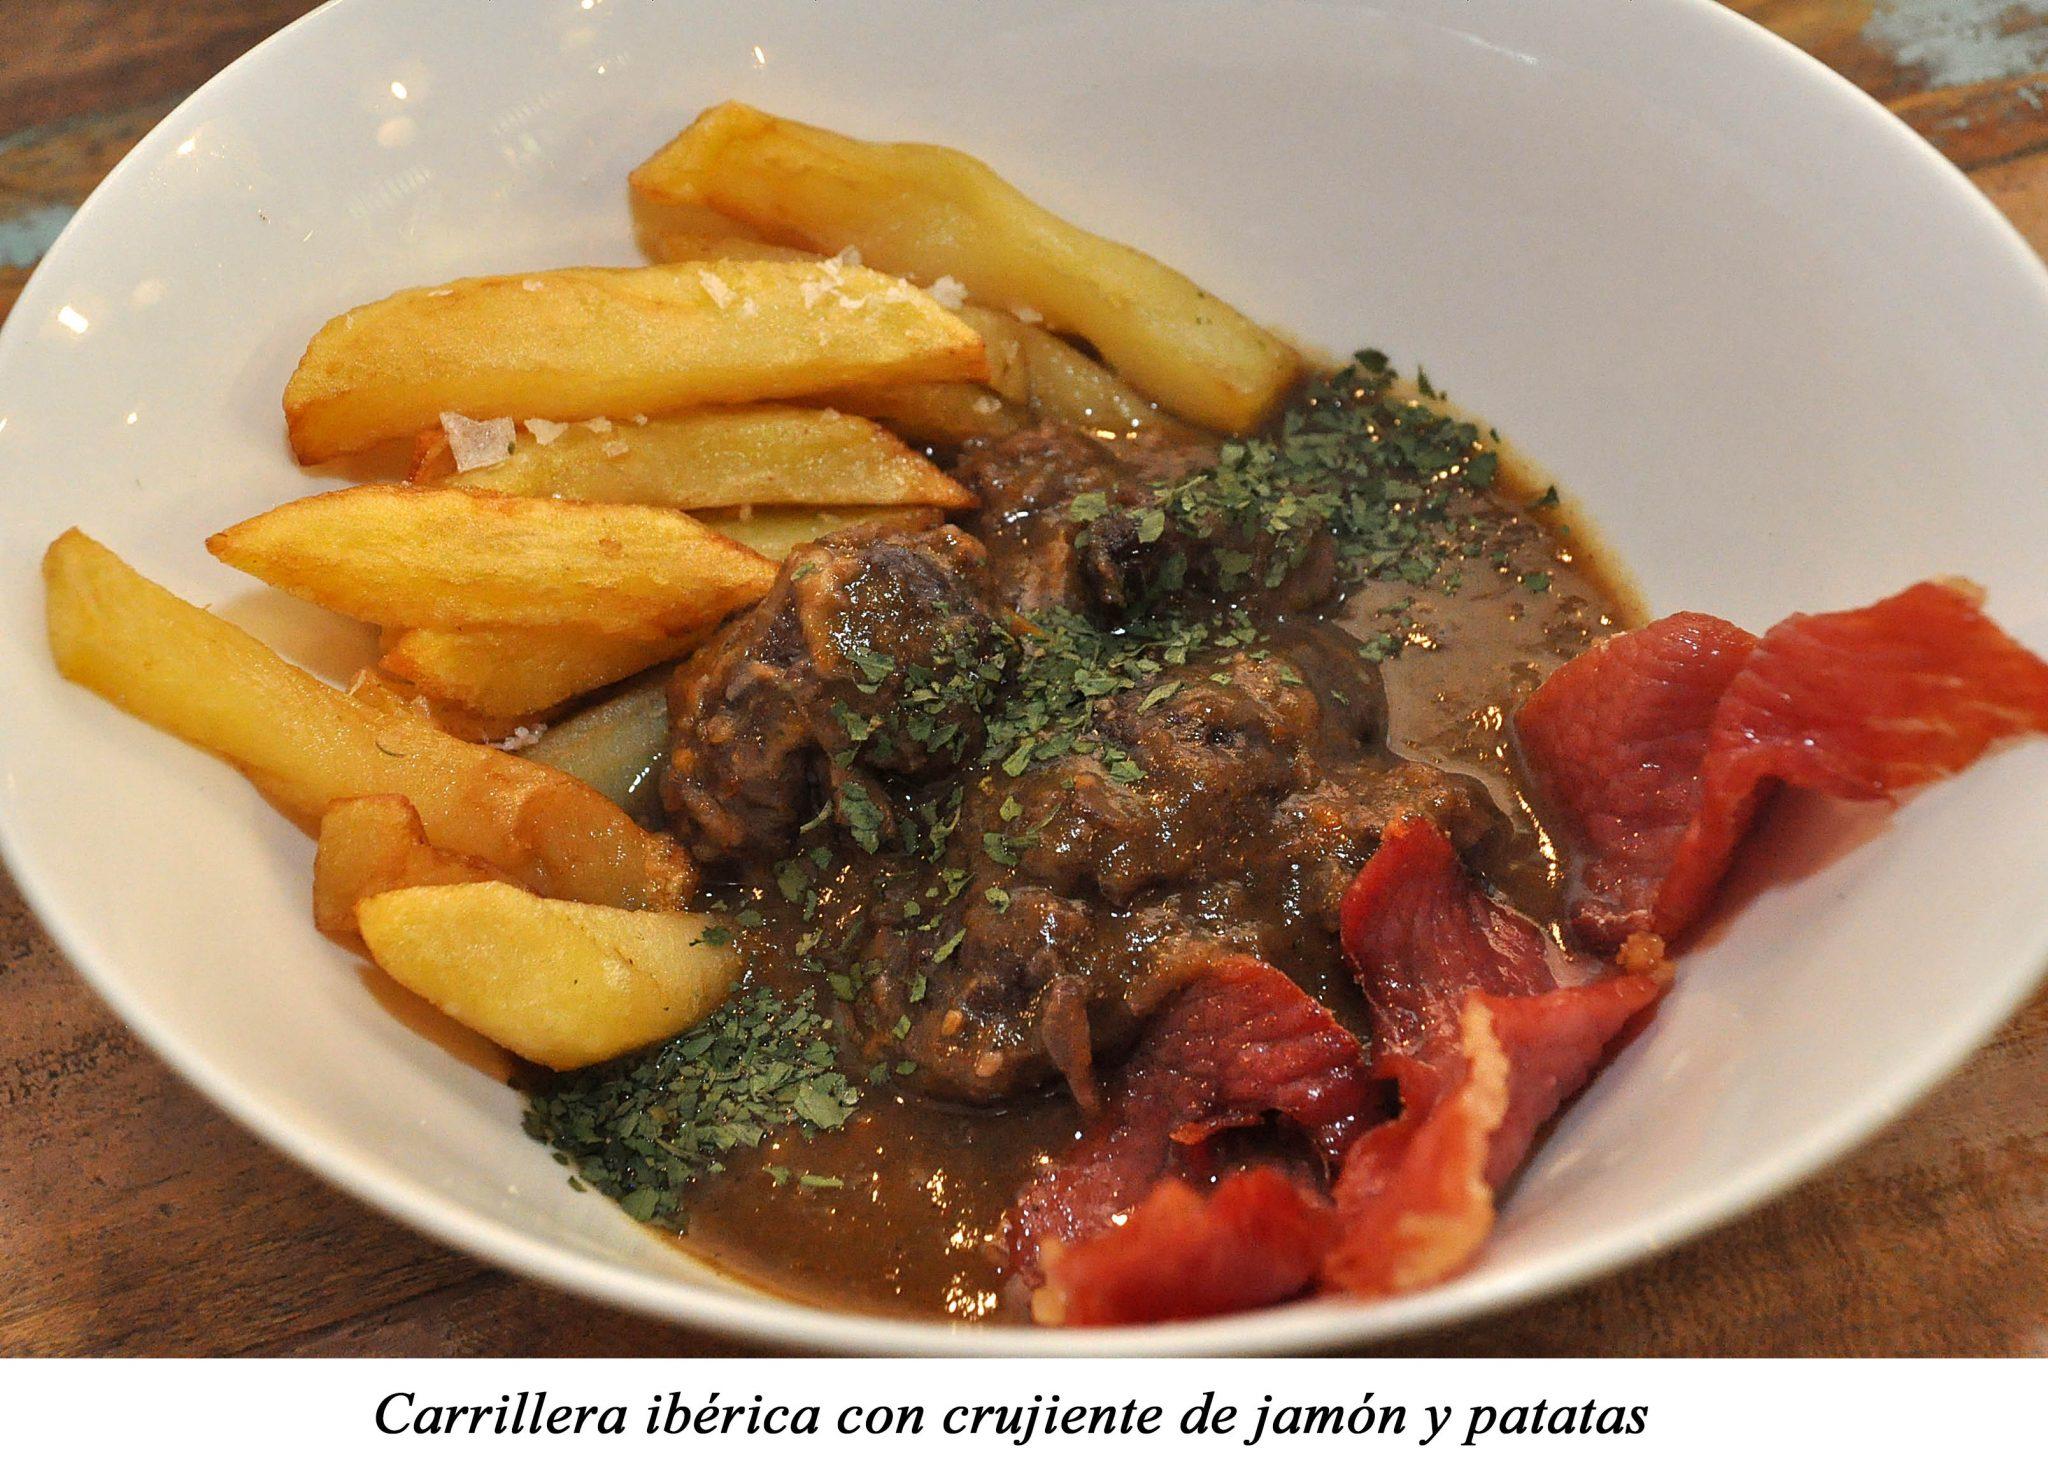 10. Carrilleras